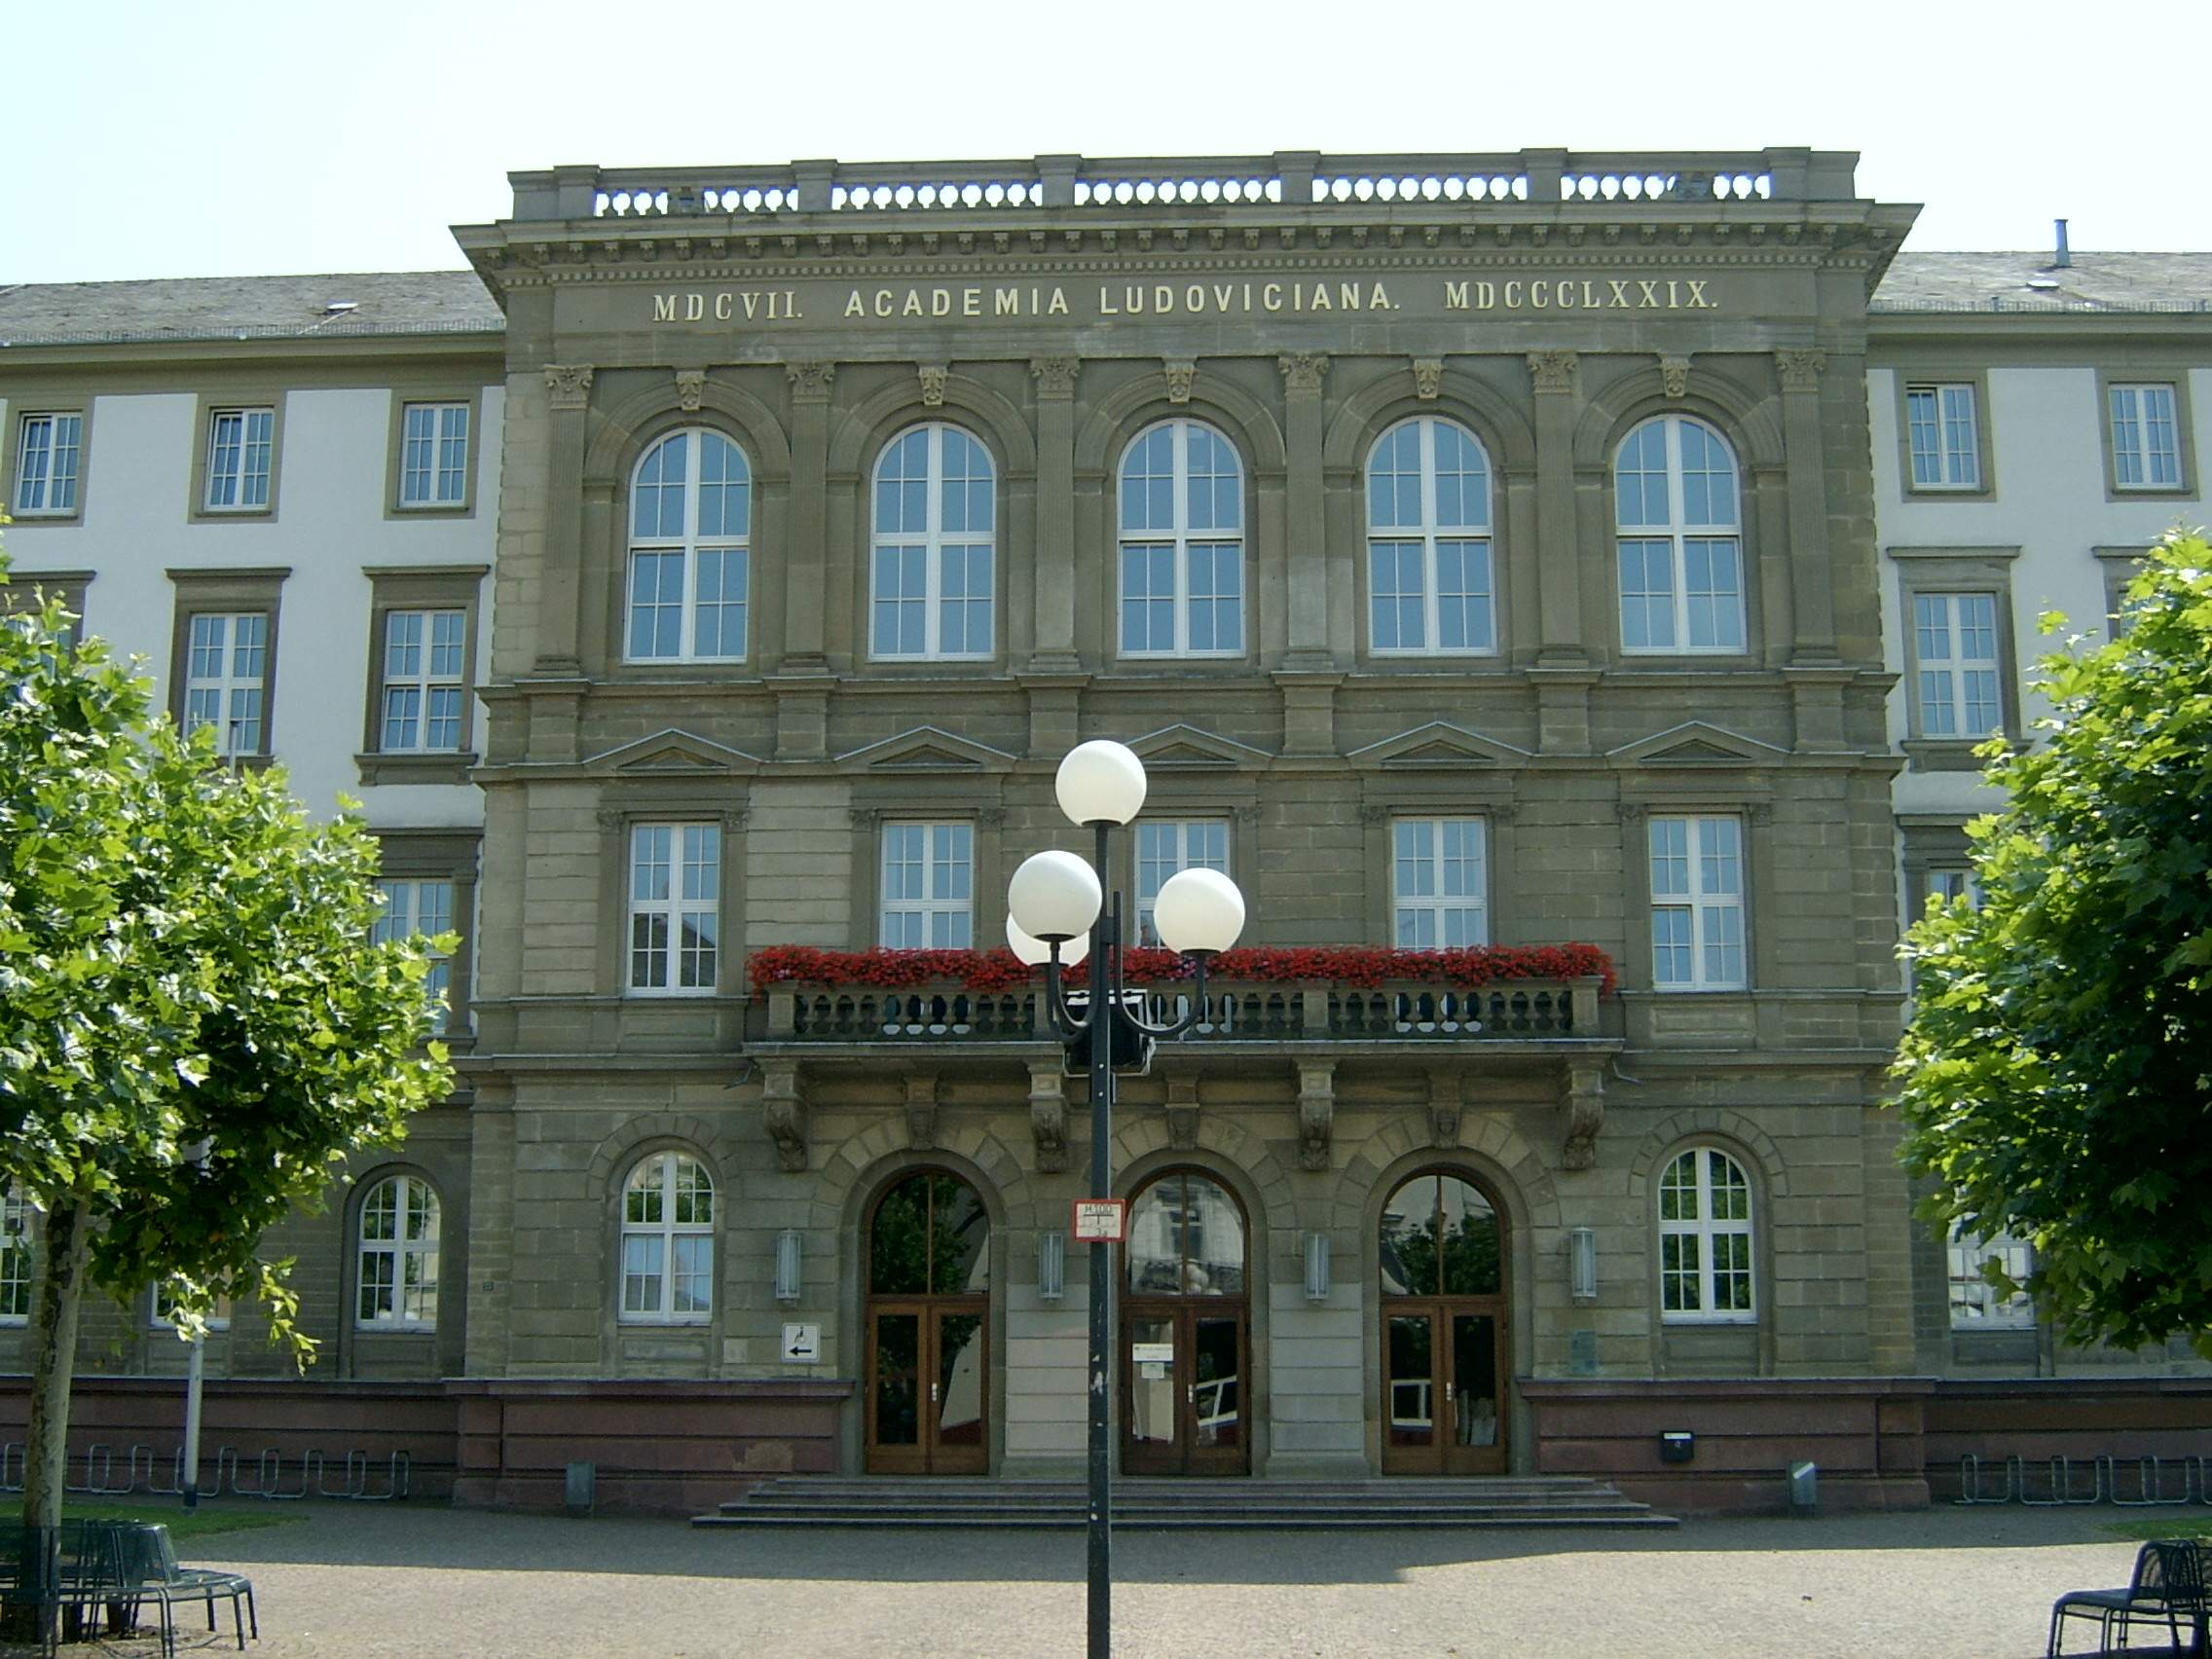 Justus-Liebig-Universität Gießen – Wikipedia